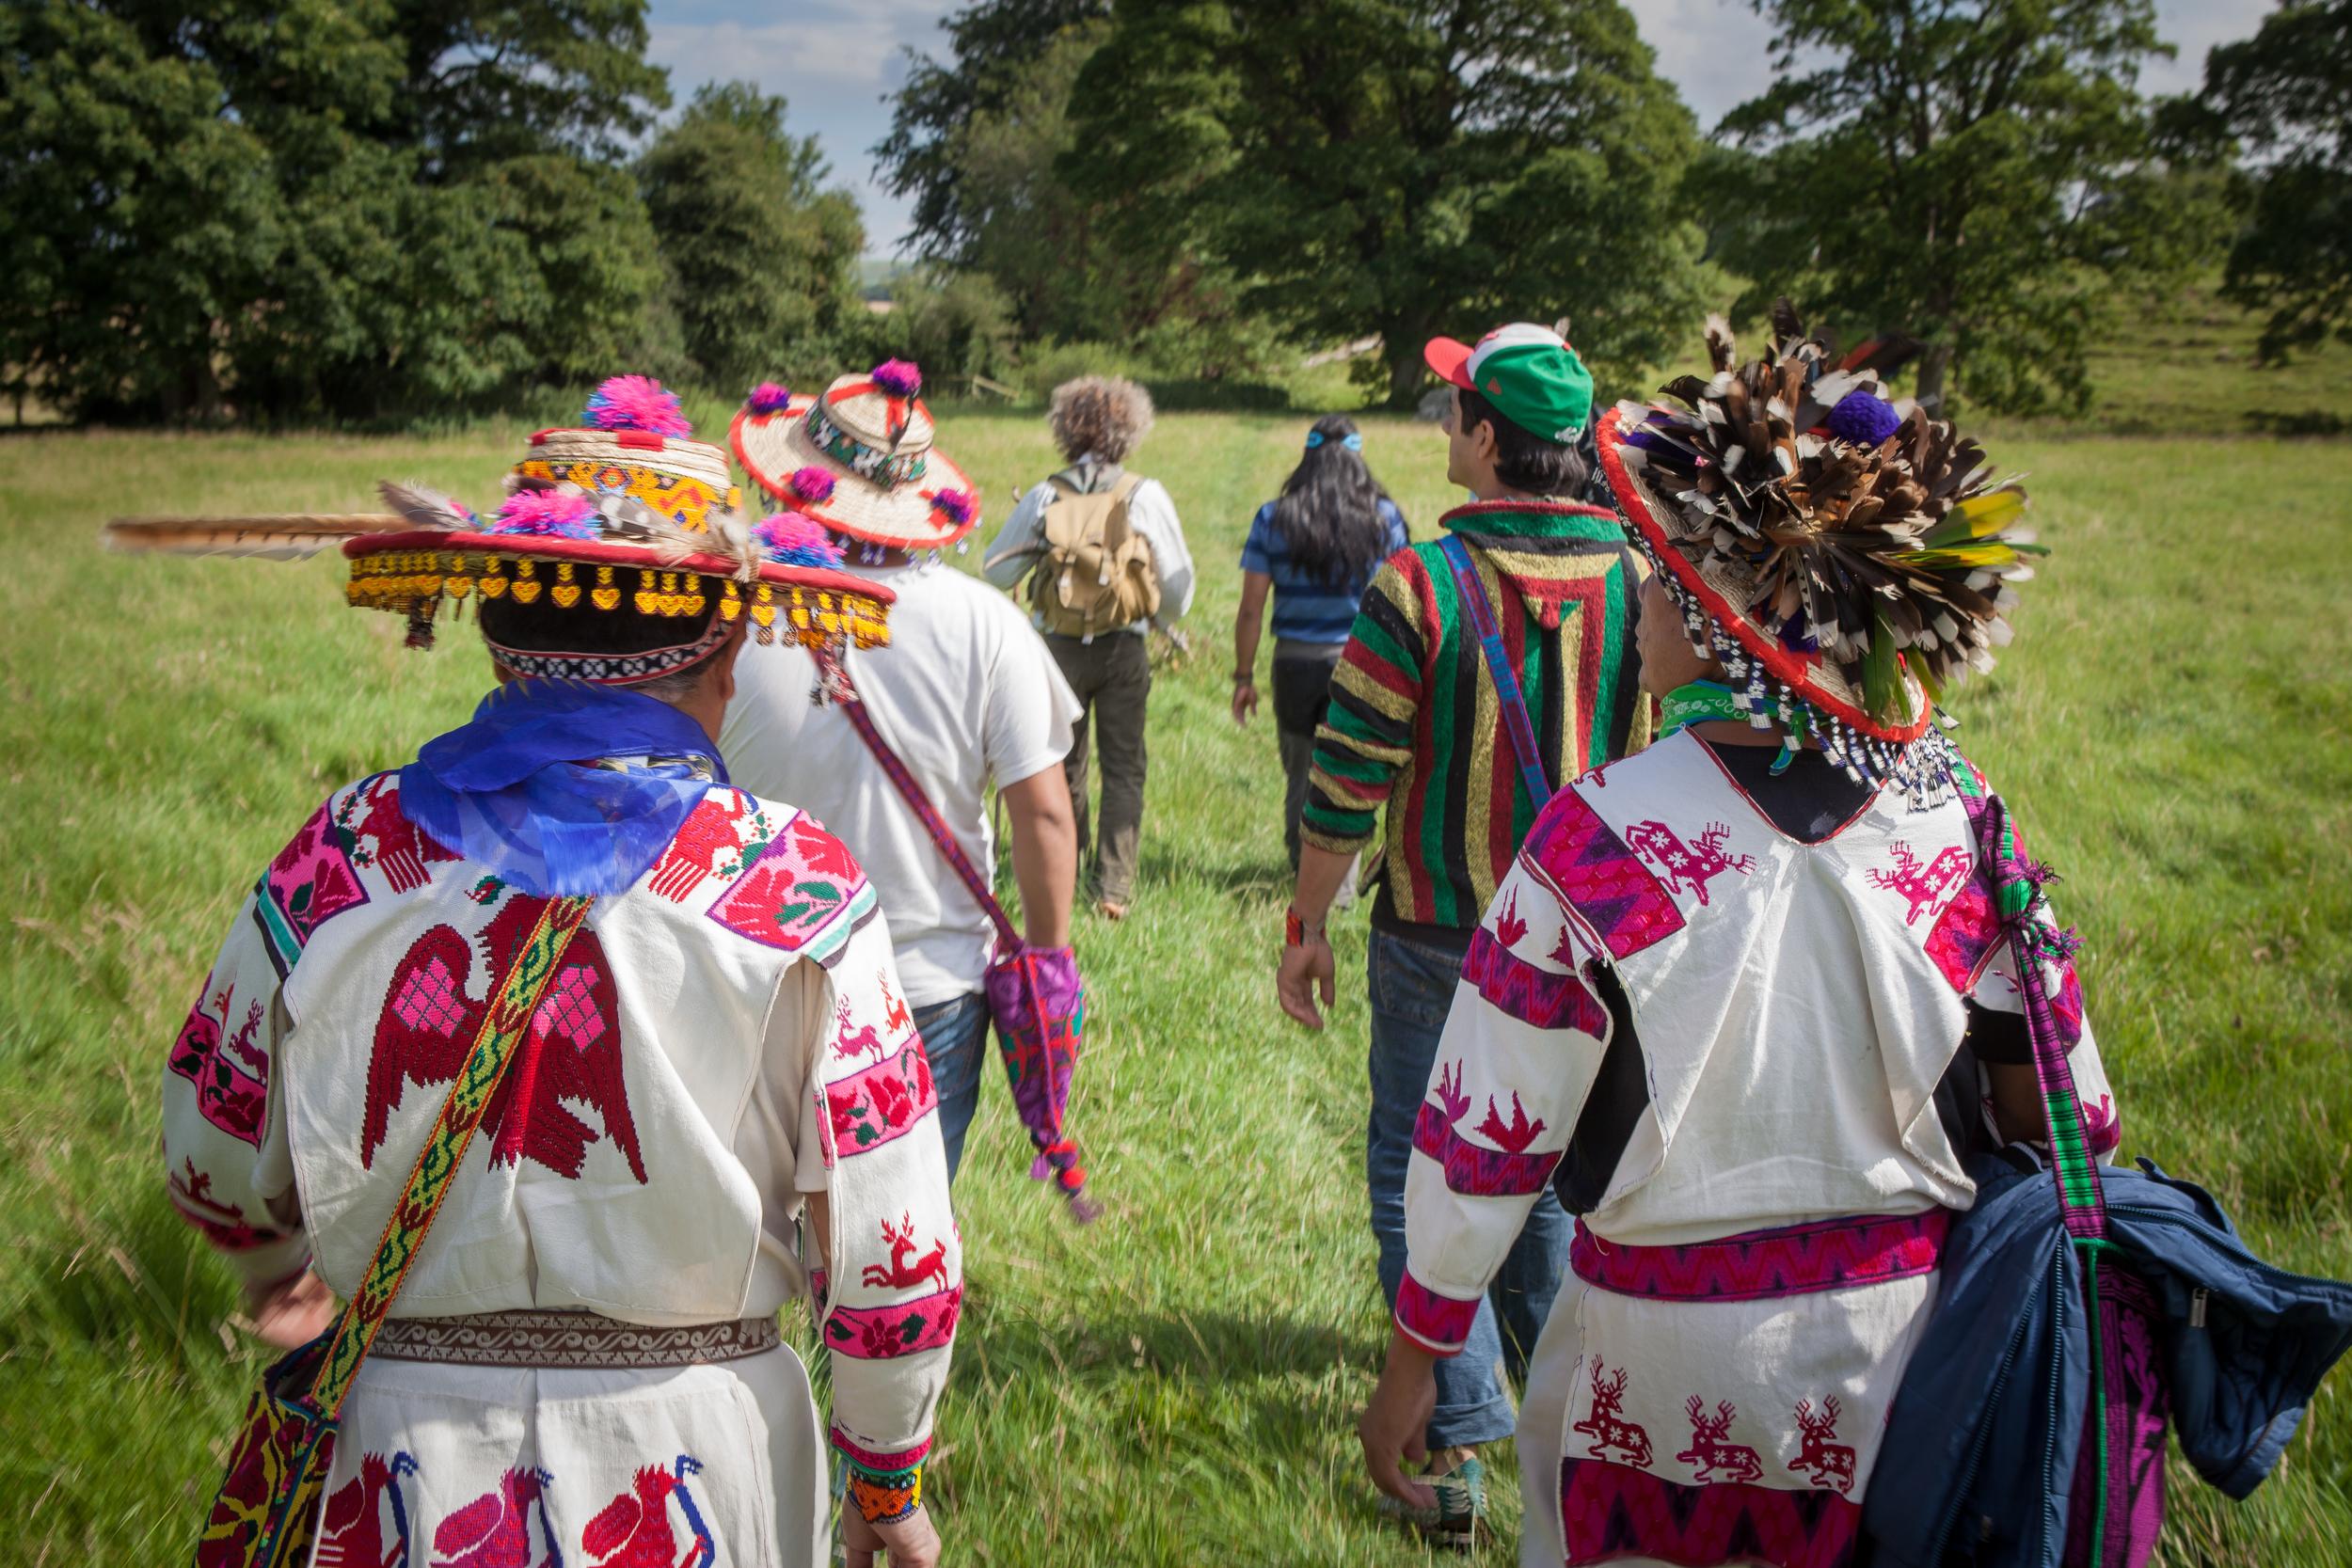 RAW gathering -Huichol Tribe, Central Mexico & Kichwa Tribe, Ecuador,South America .   Photography by Jeremy Whelehan